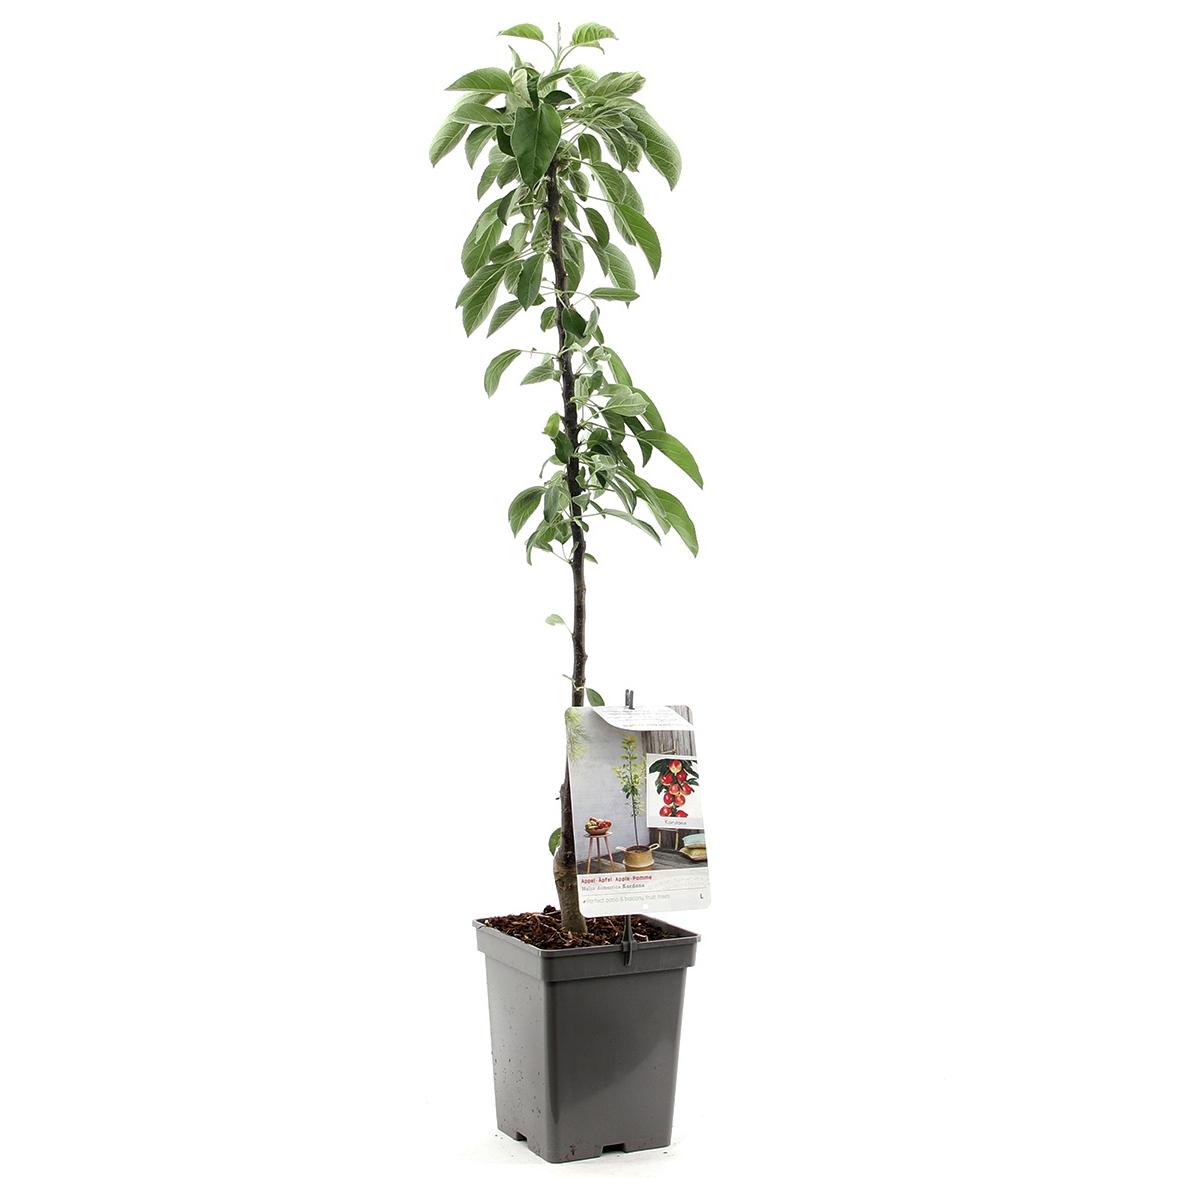 Zuil-appelboom Malus domestica 'Kordona'